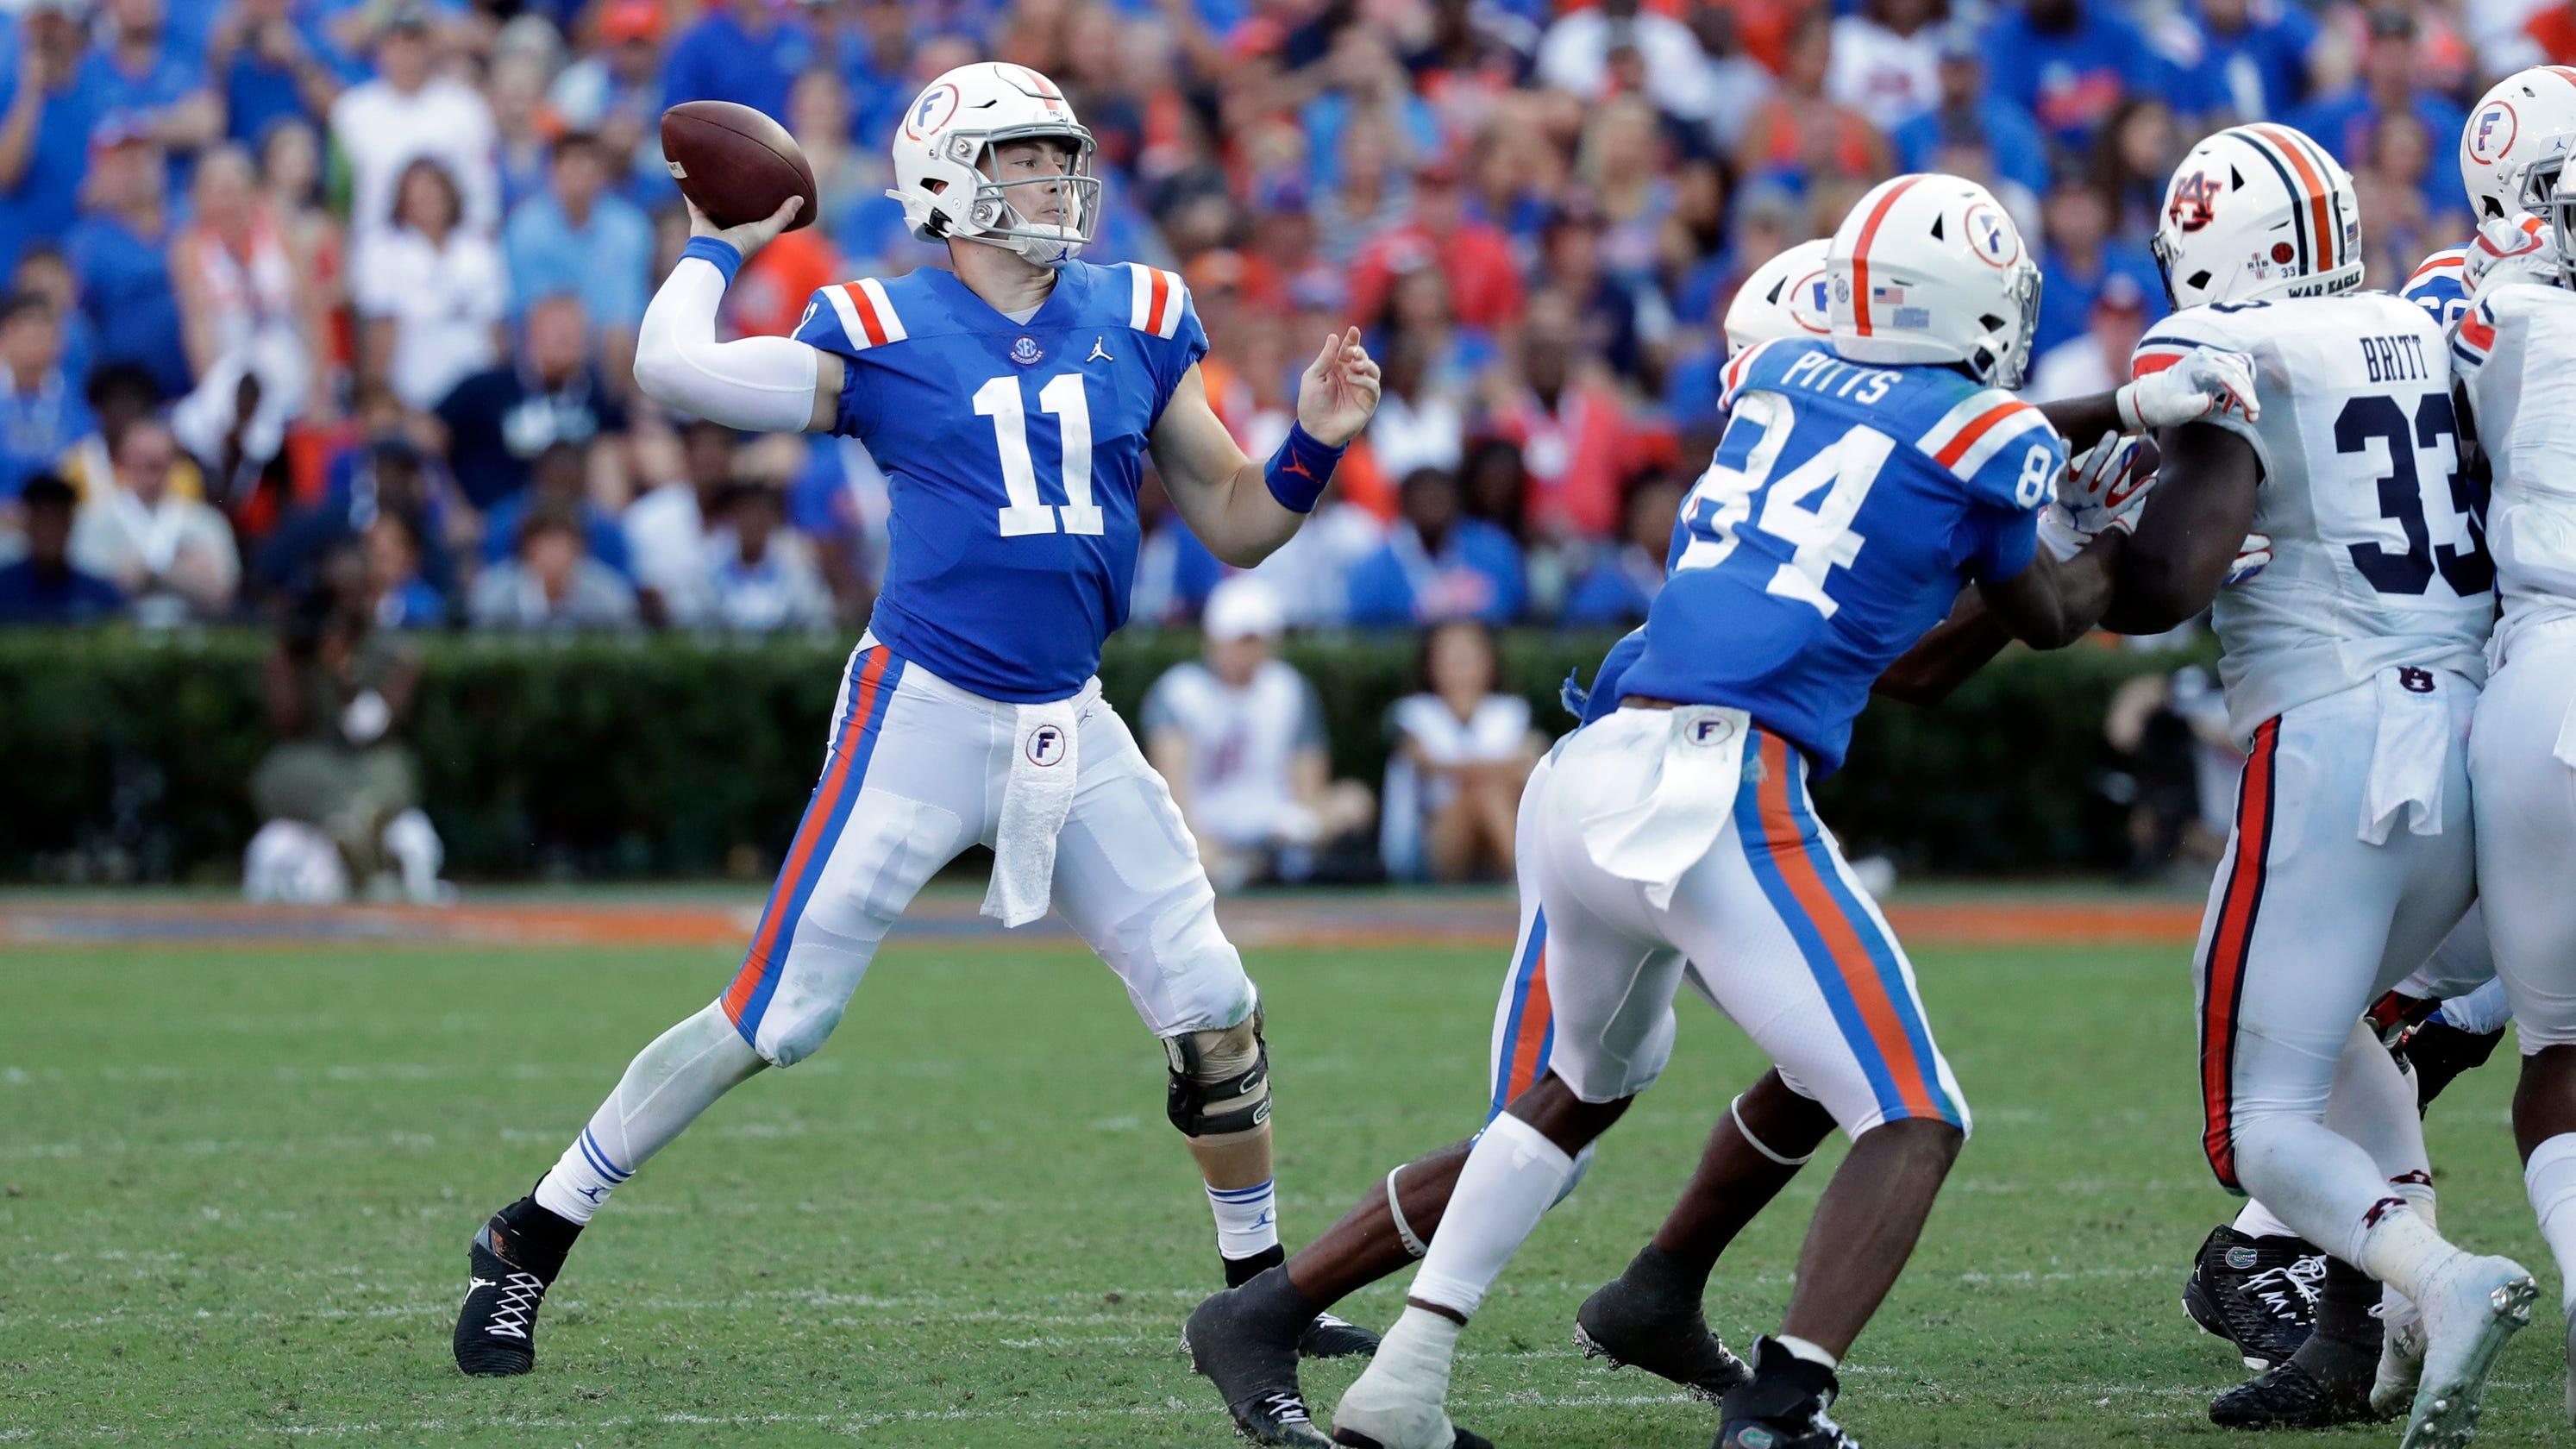 Florida, Auburn, LSU top College Football Playoff Week 4 impact games